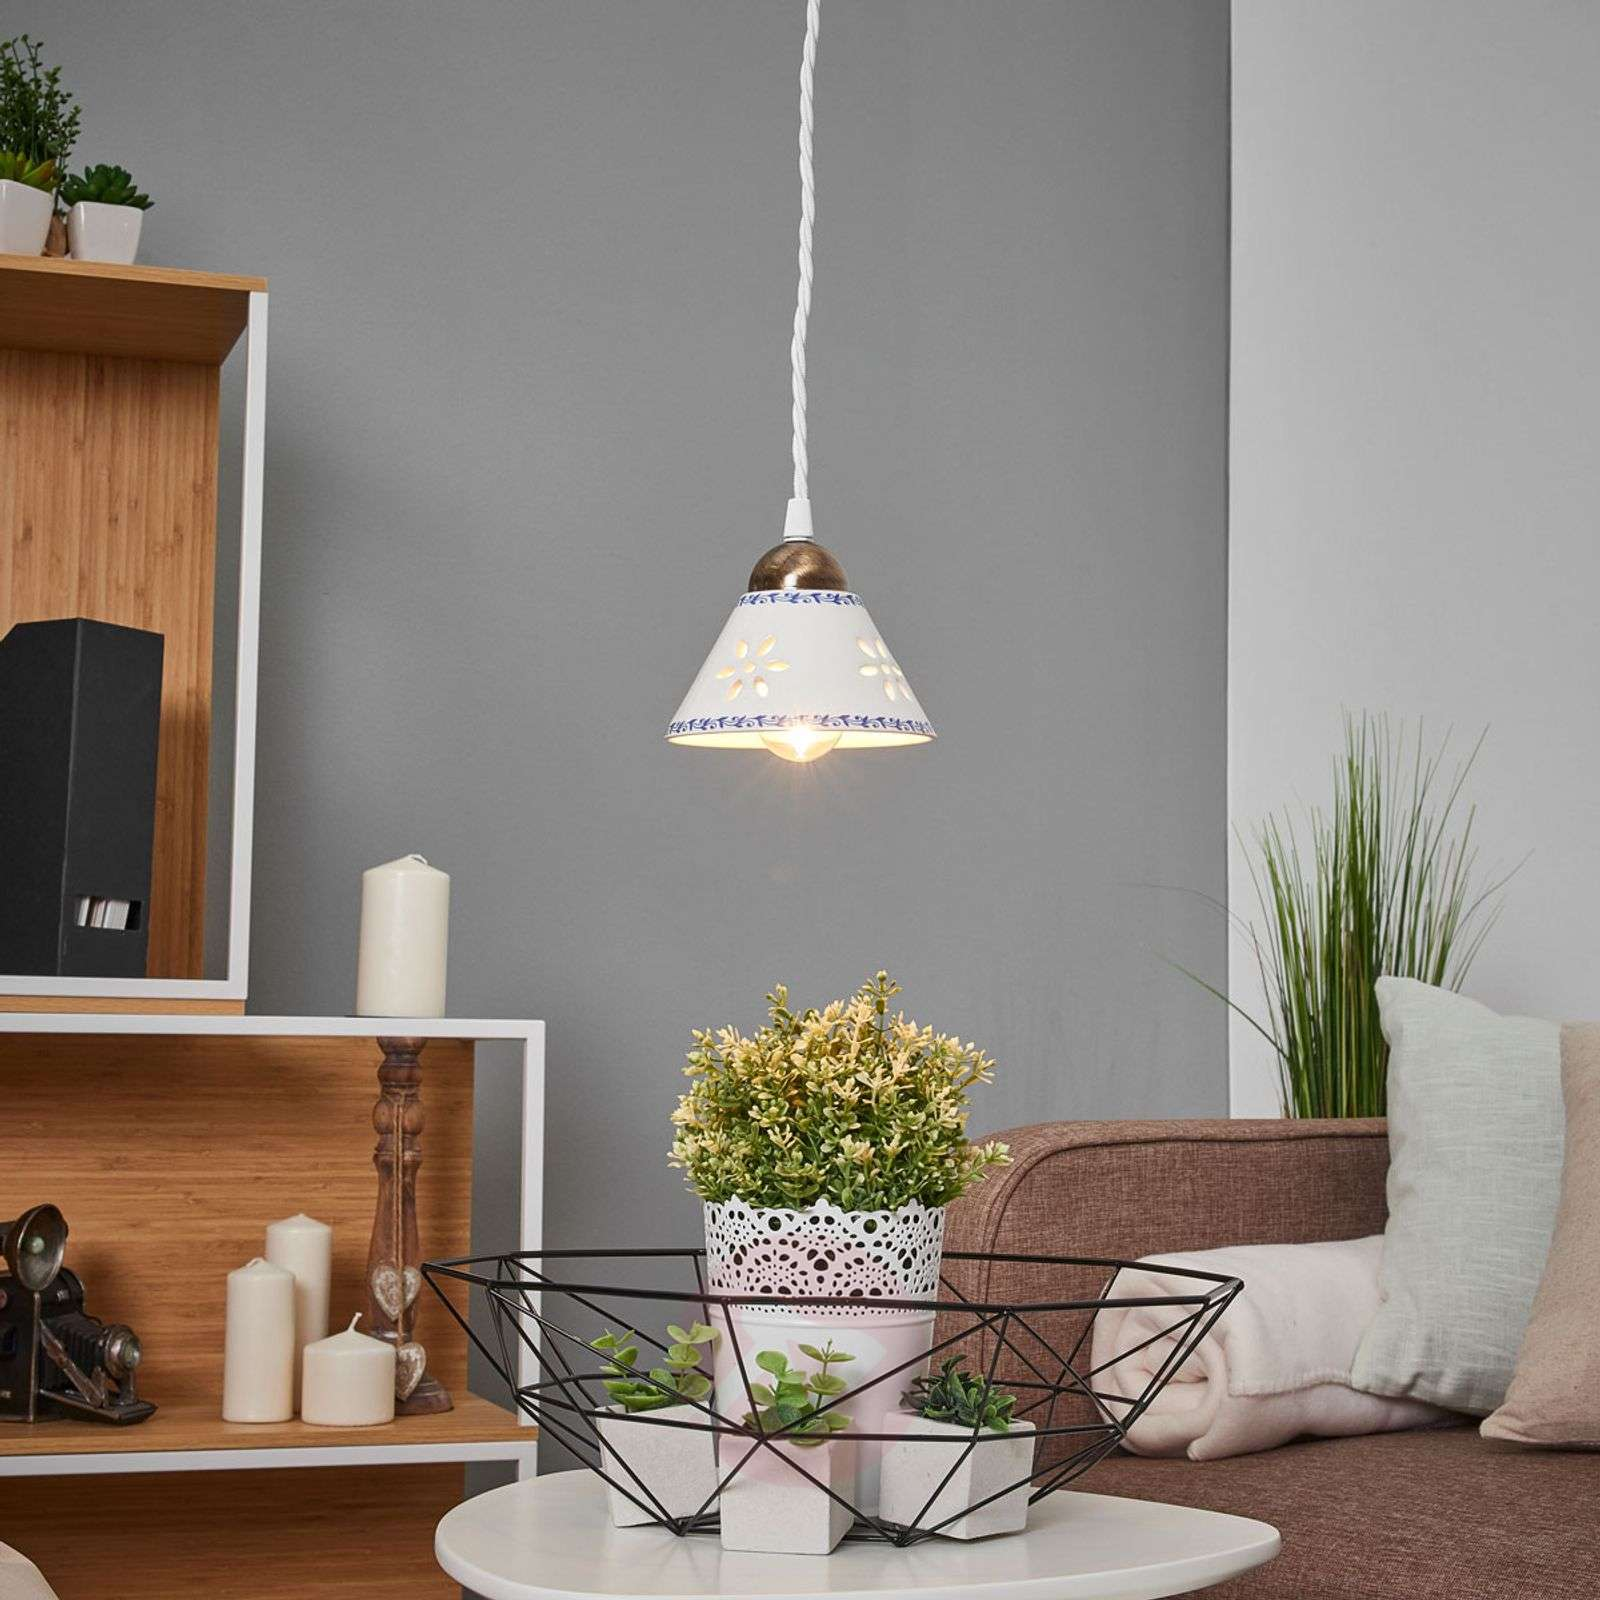 NONNA hanging light, made of white ceramic-2013026-01